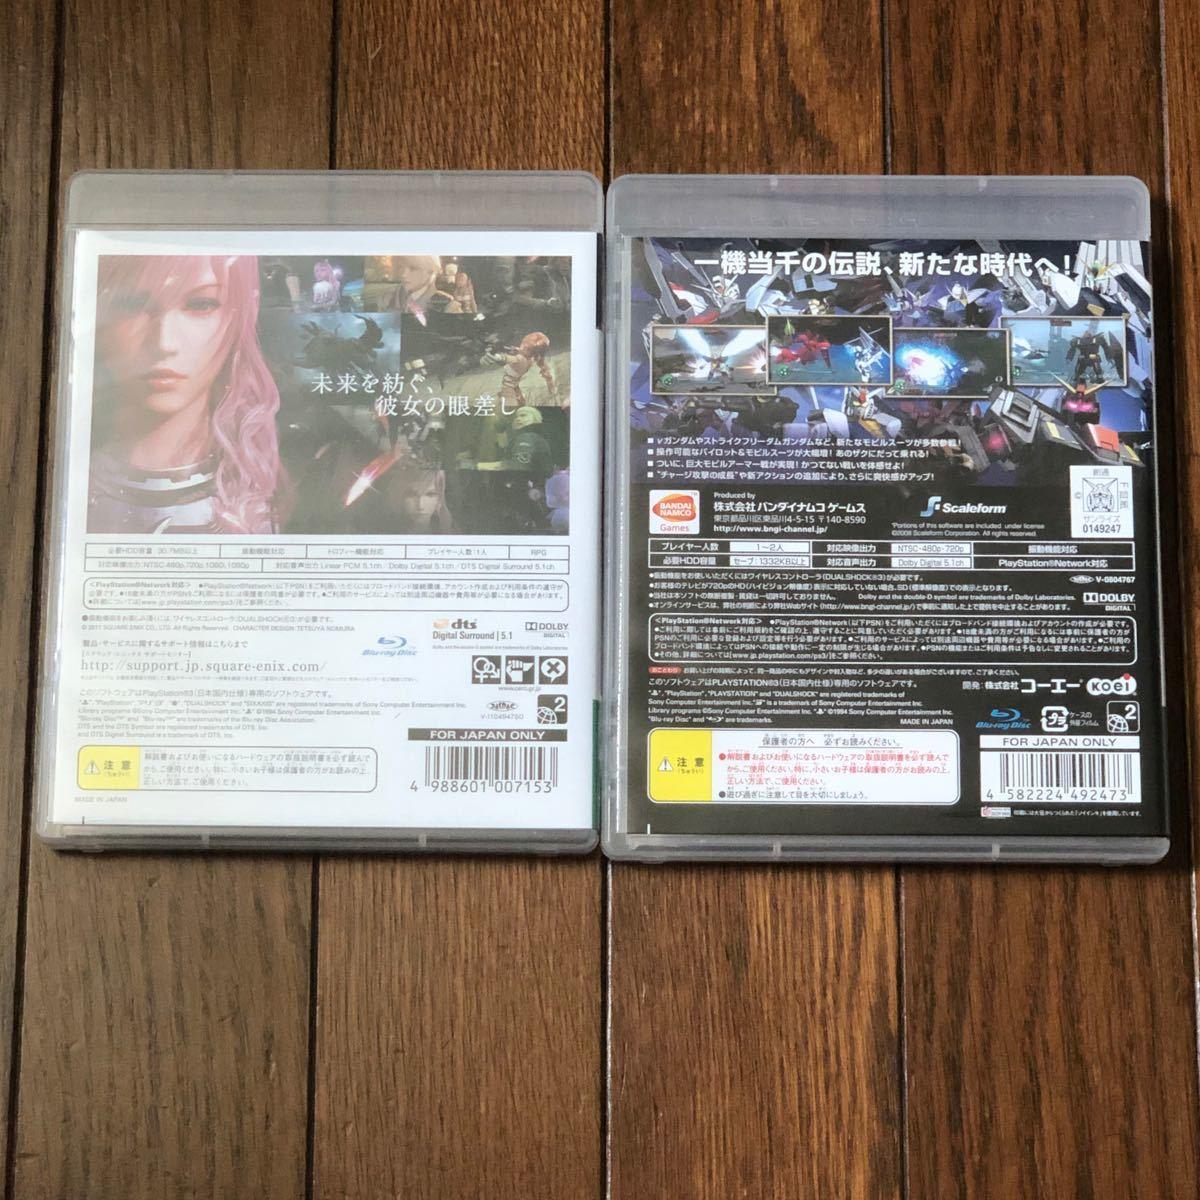 PS3 ファイナルファンタジー13-2・ガンダム無双2 2点セット